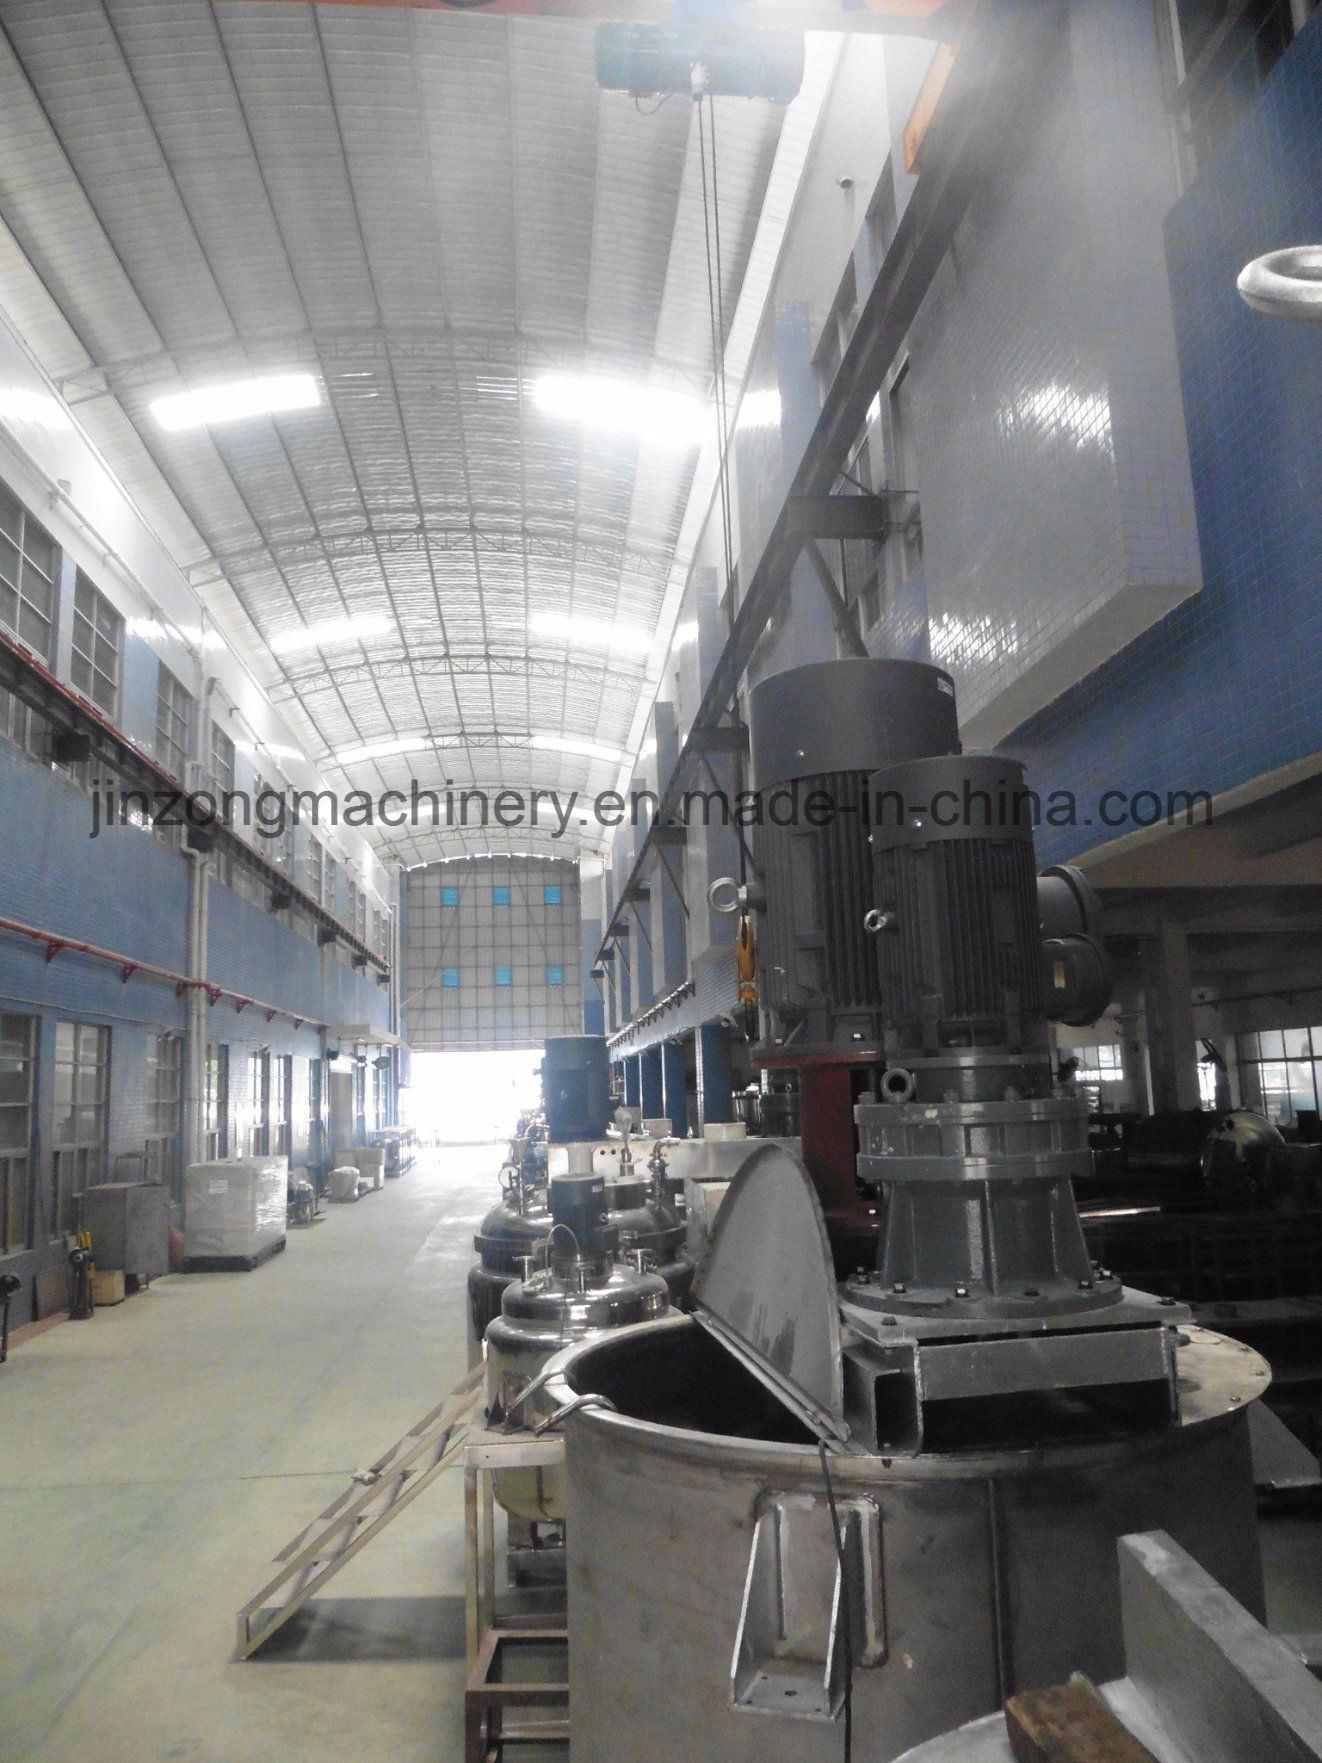 China Car Paint Prduction Making Kettle Manufacturer